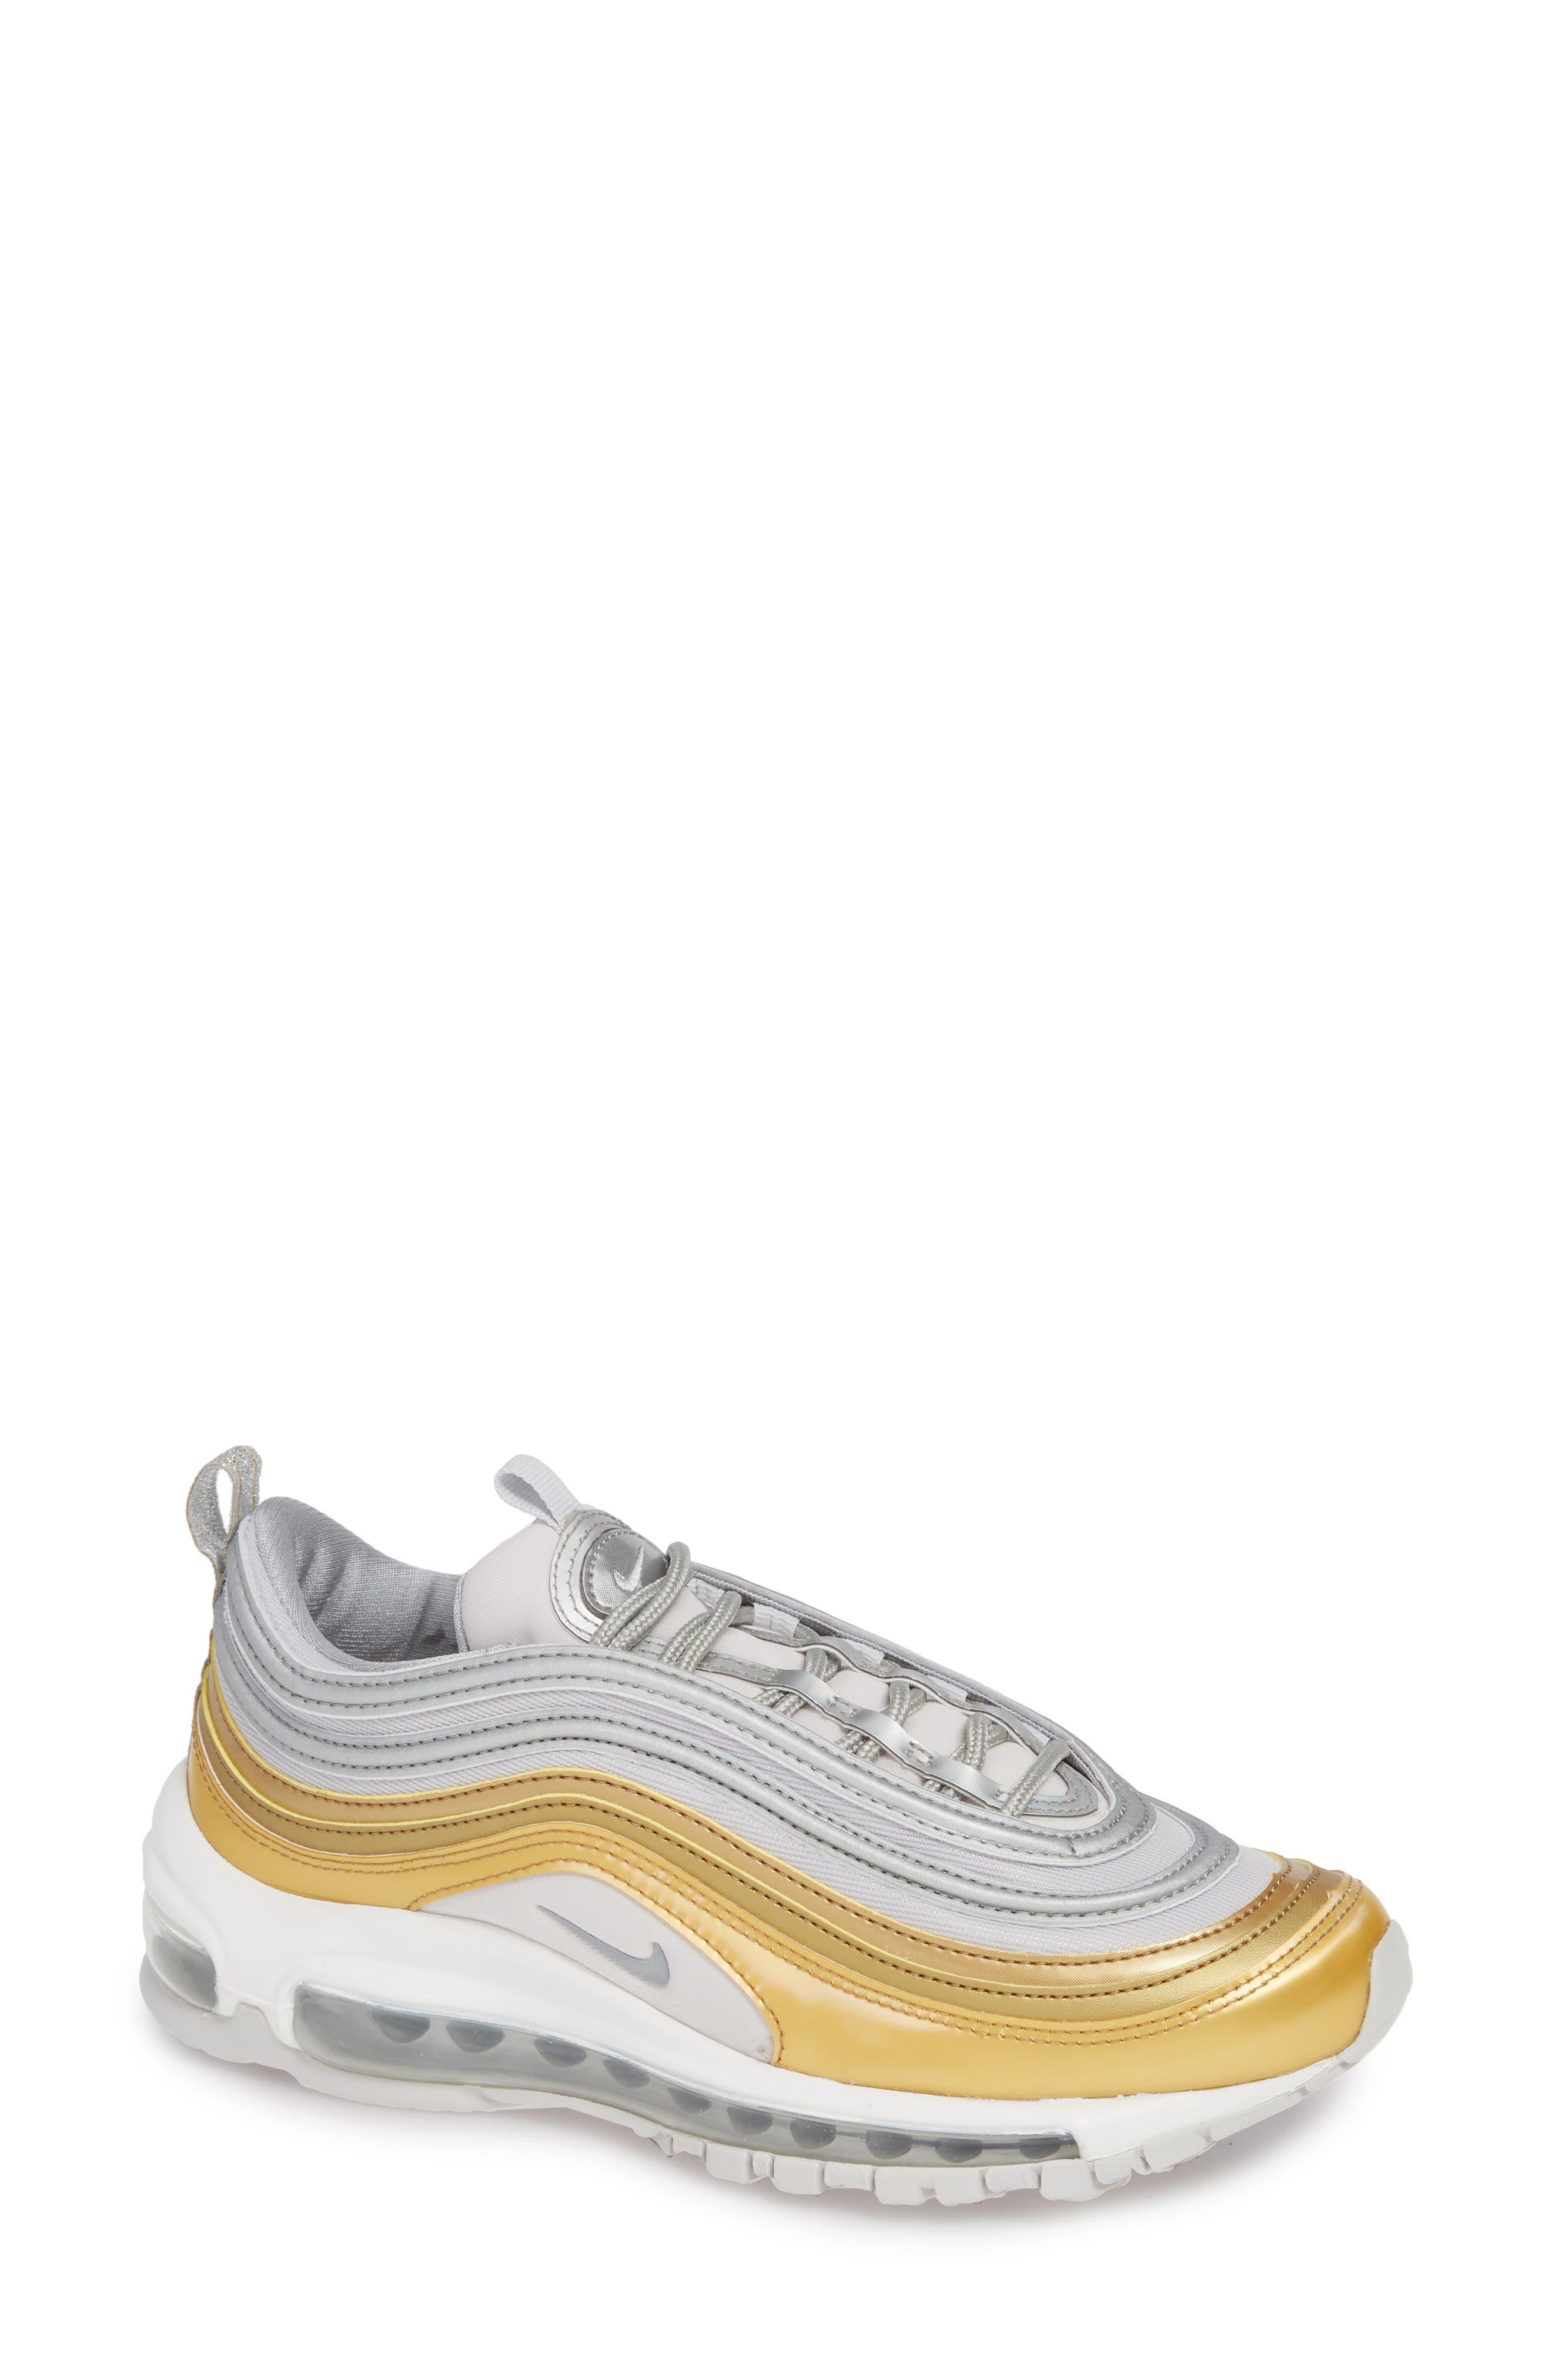 Air Max 97 SE Sneaker,                             Main thumbnail 1, color,                             GREY/ METALLIC SILVER- GOLD